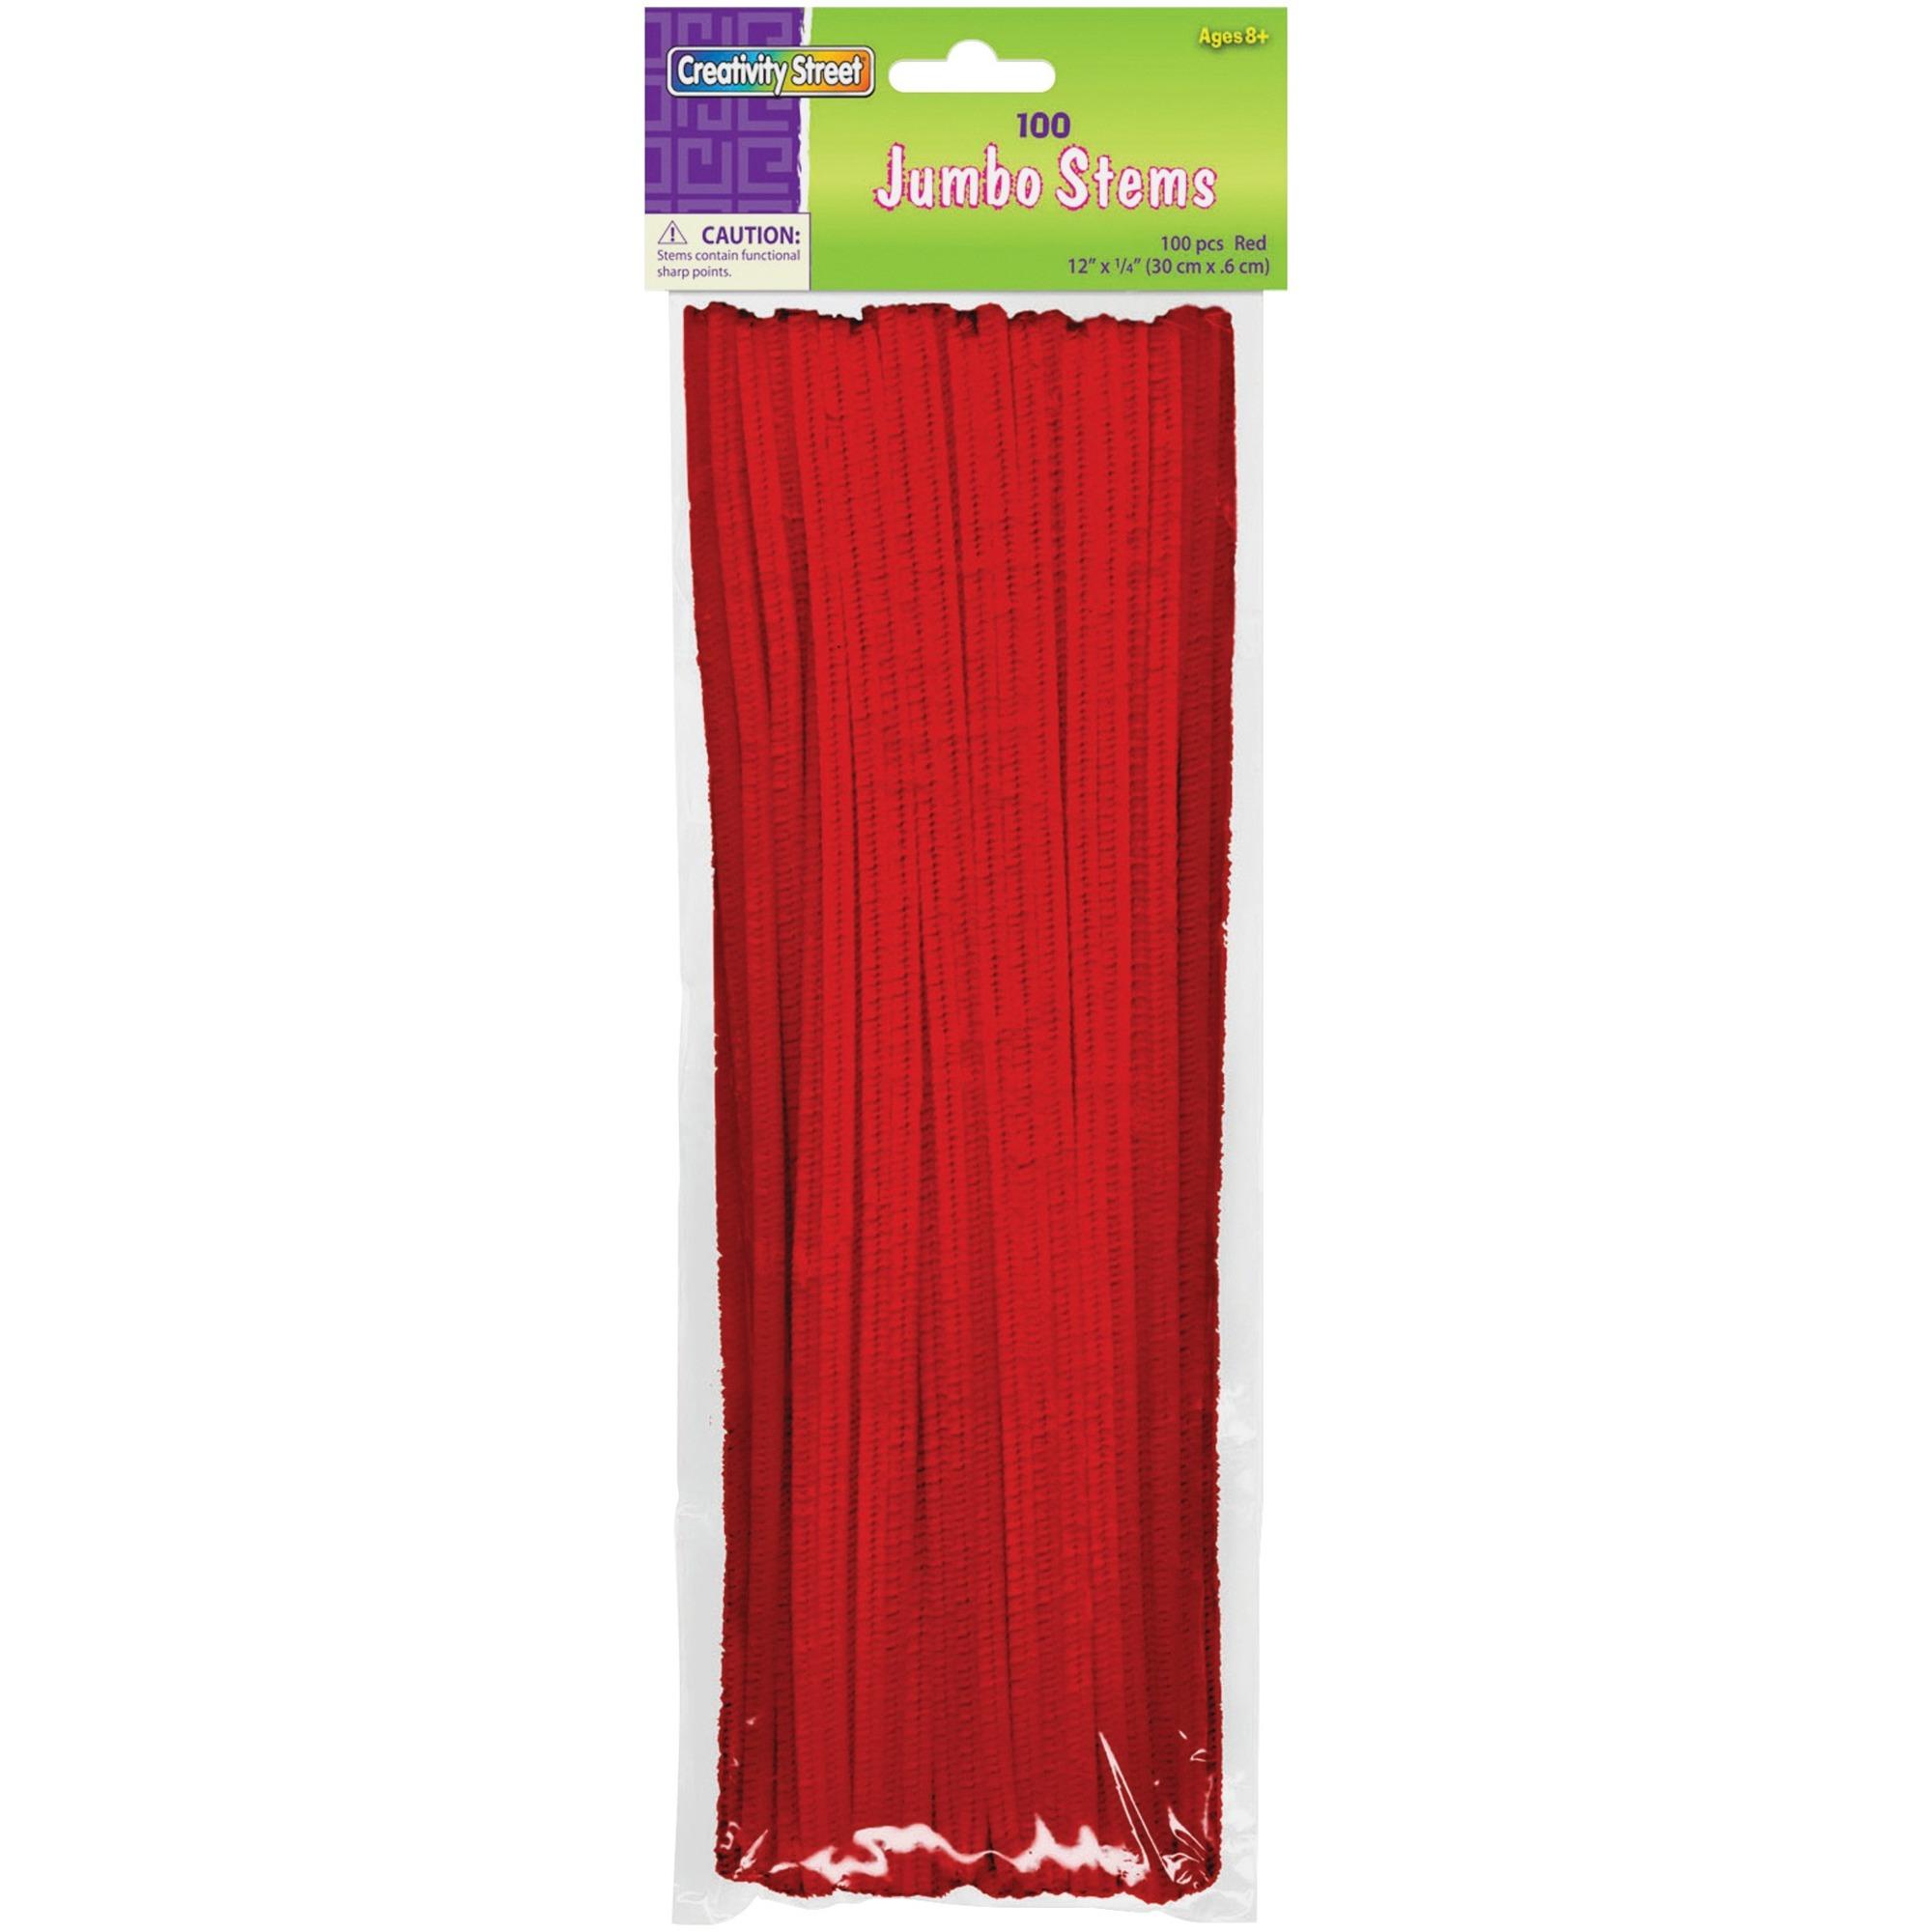 Pacon Corporation Creativity Street Jumbo Bendable Stems - 12 X 0.2 - 600 / Bag - Red